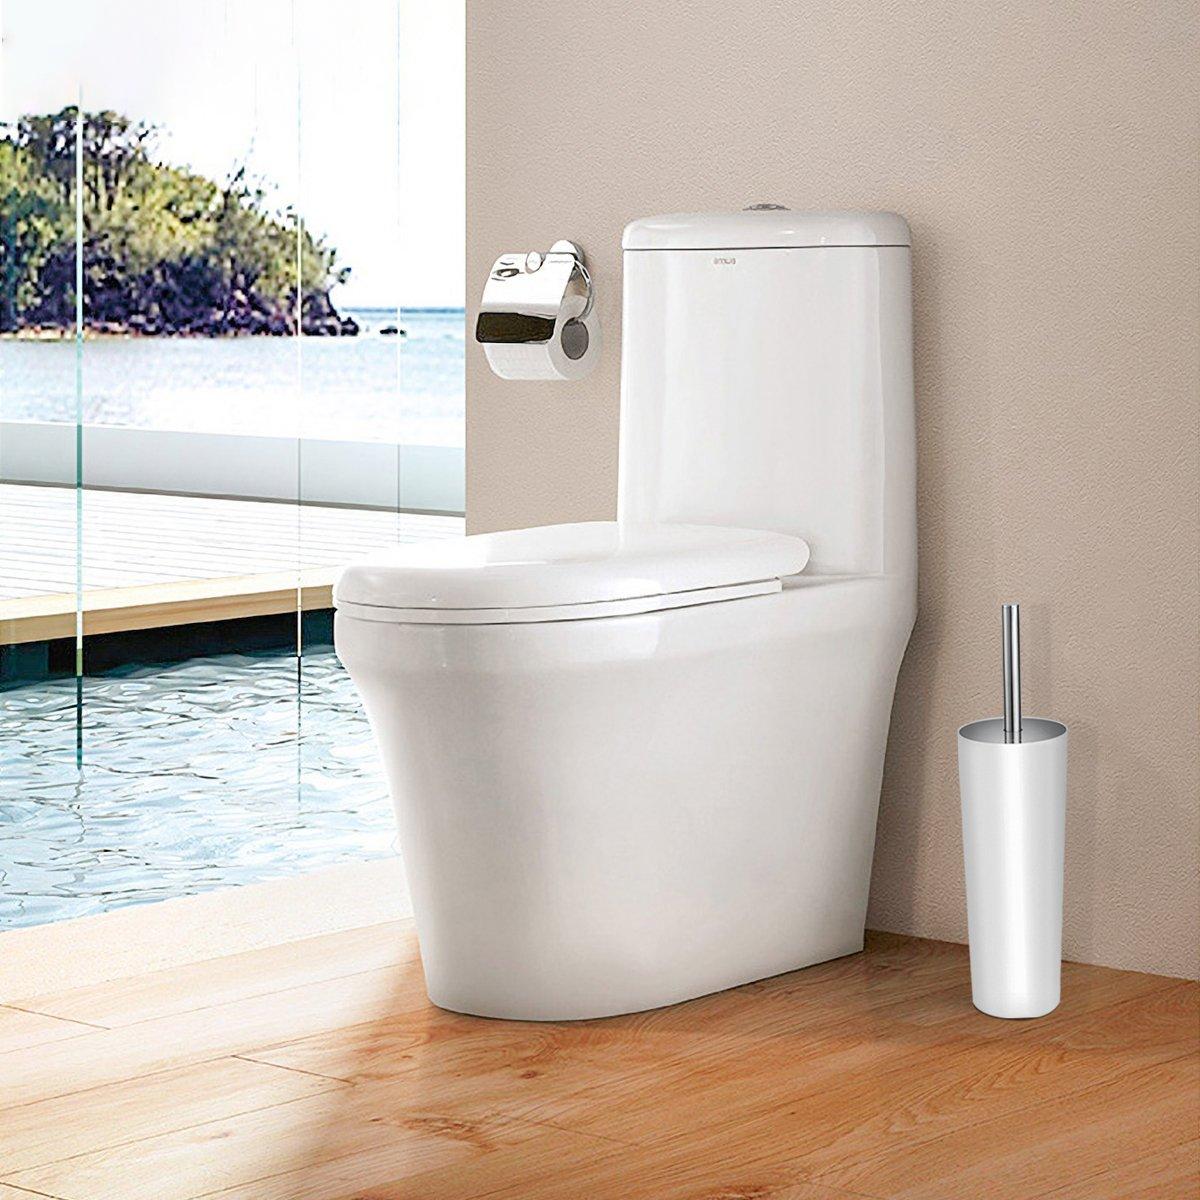 OUNONA Toilet Brush and Holder Set Good Grip Compact Toilet Bowl Cleaner Bath Scrubber Set White